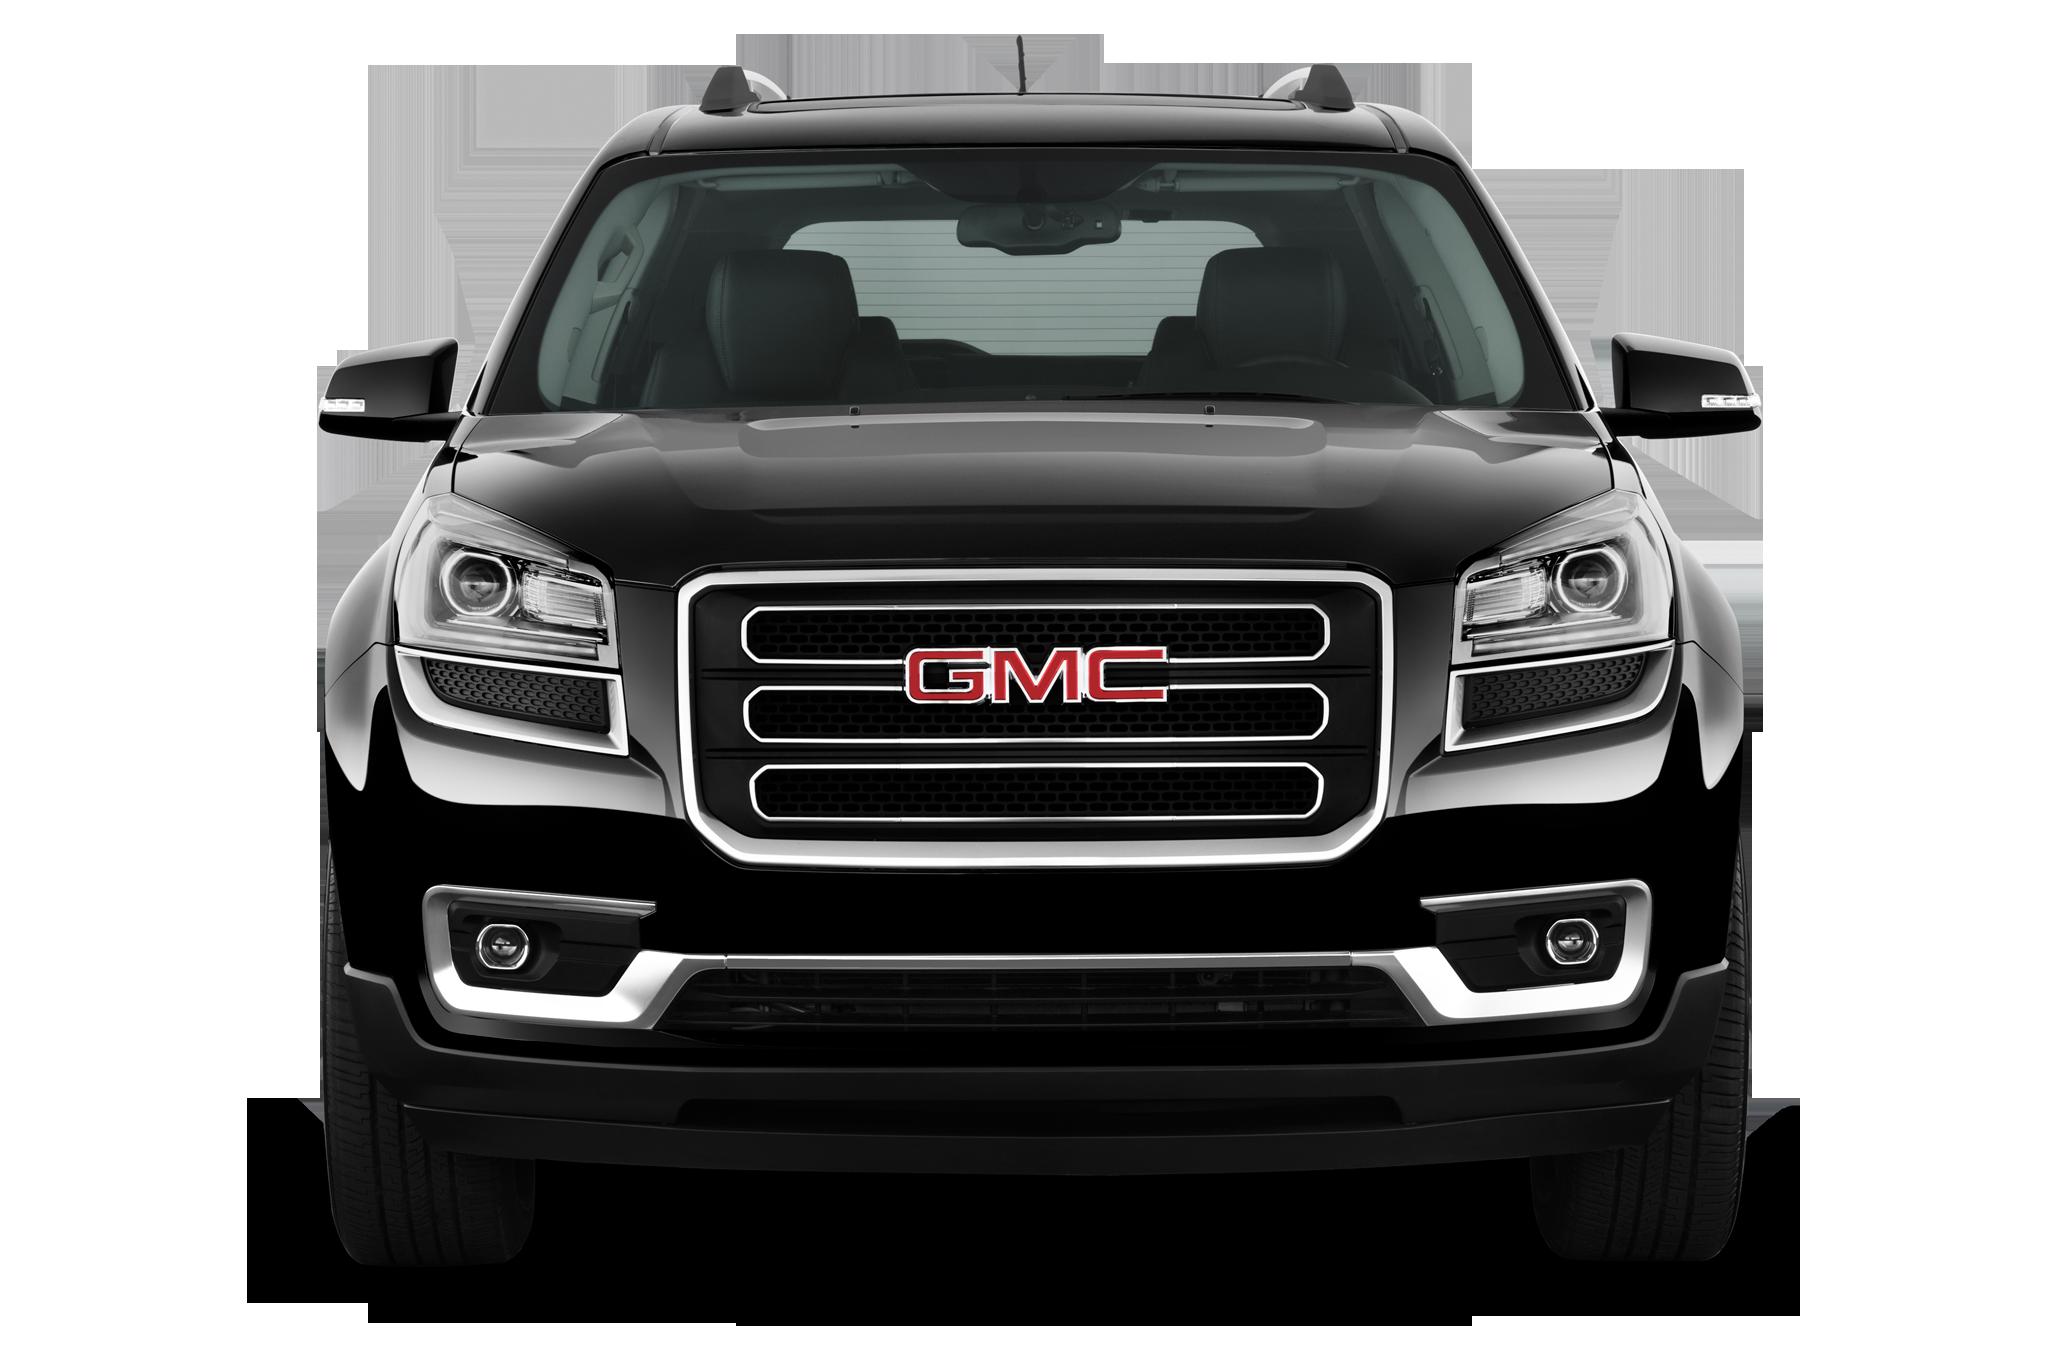 GMC Acadia I Restyling 2013 - 2016 SUV 5 door #4